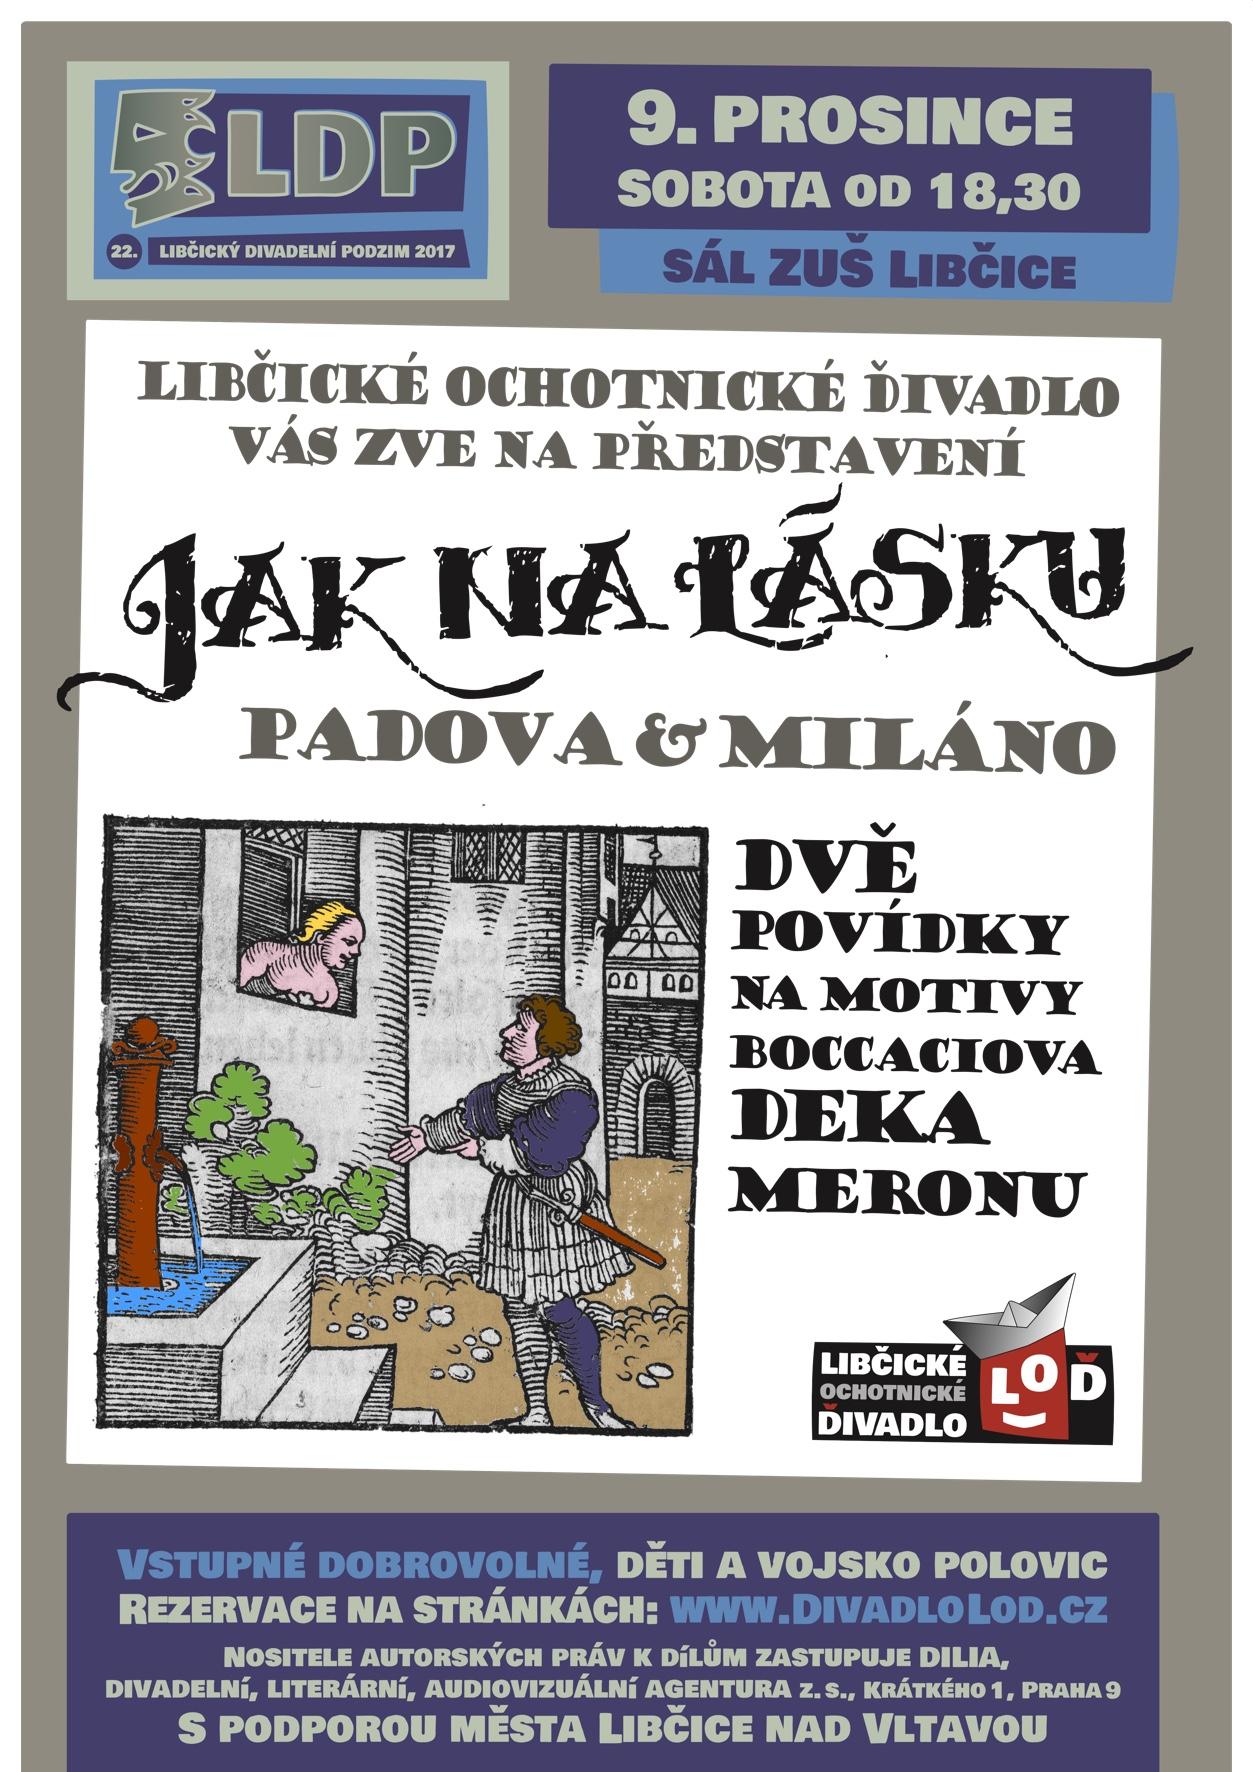 LDP 2017: Jak na lásku - Padova a Miláno